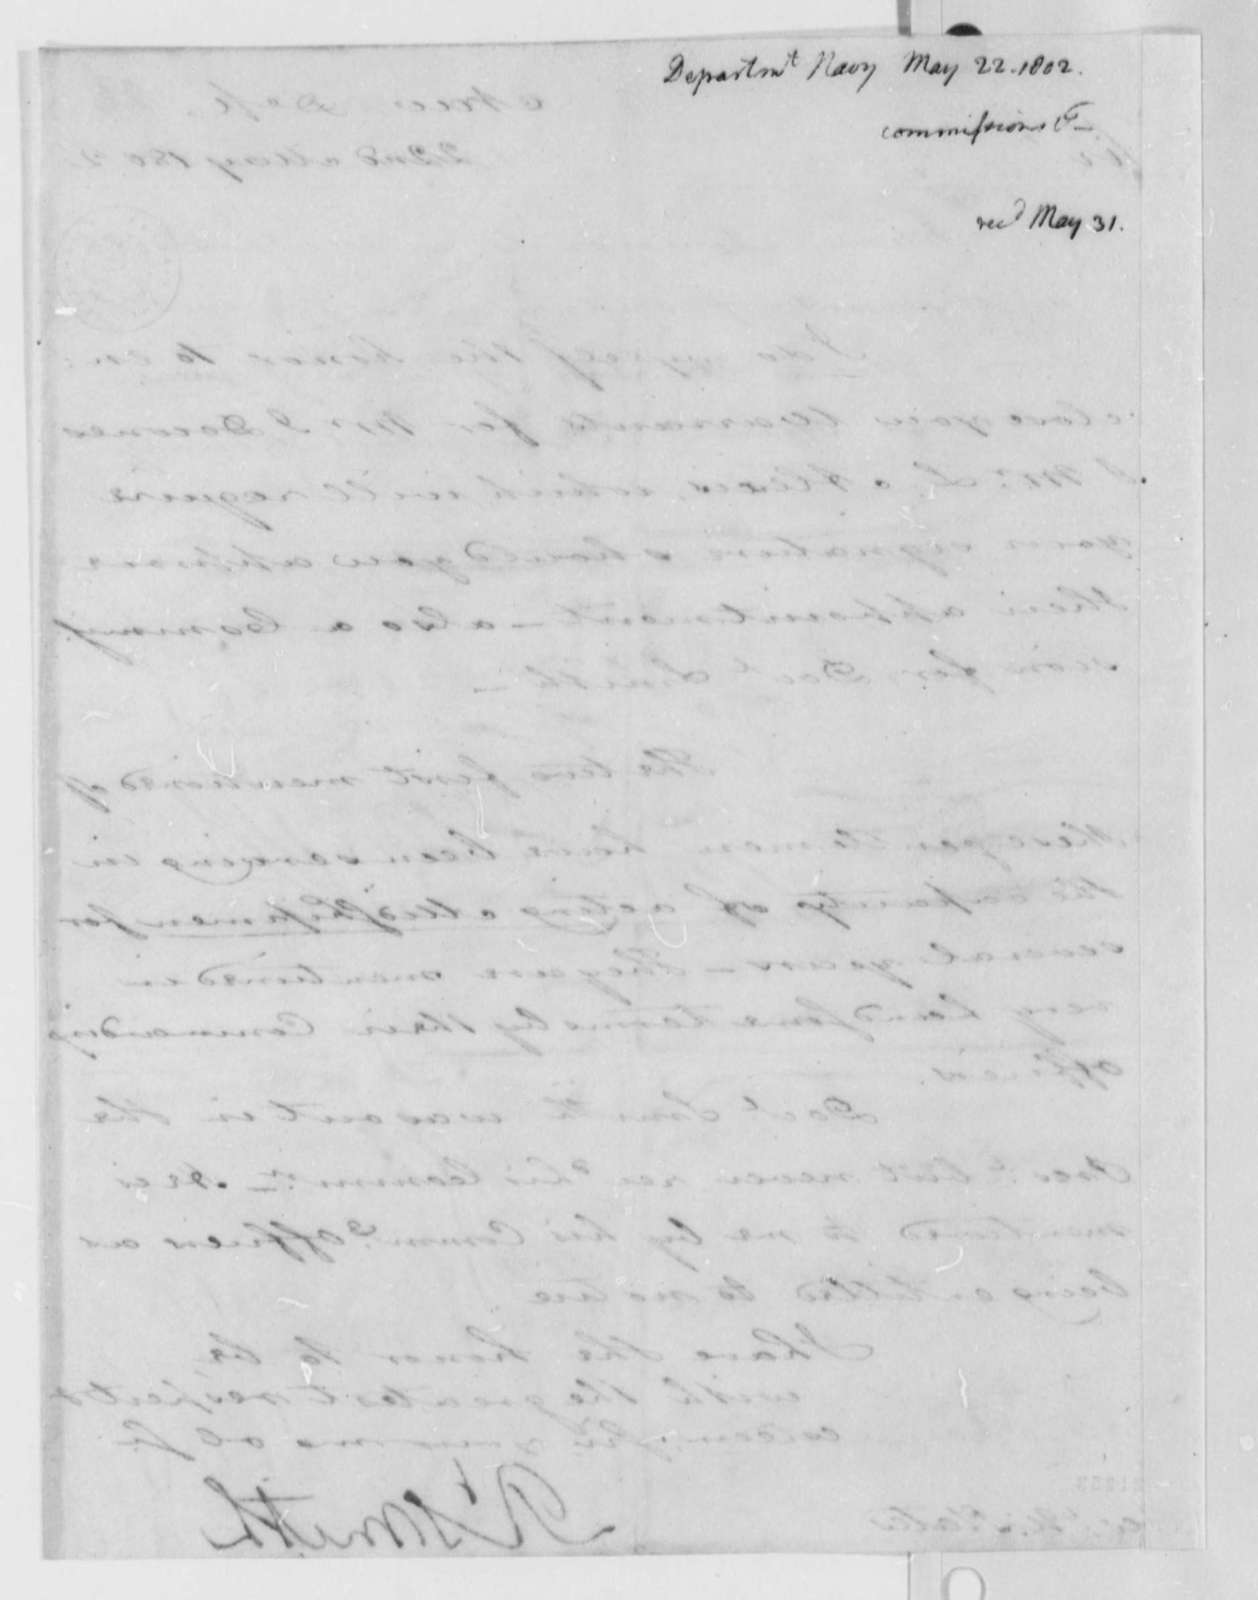 Robert Smith to Thomas Jefferson, May 22, 1802